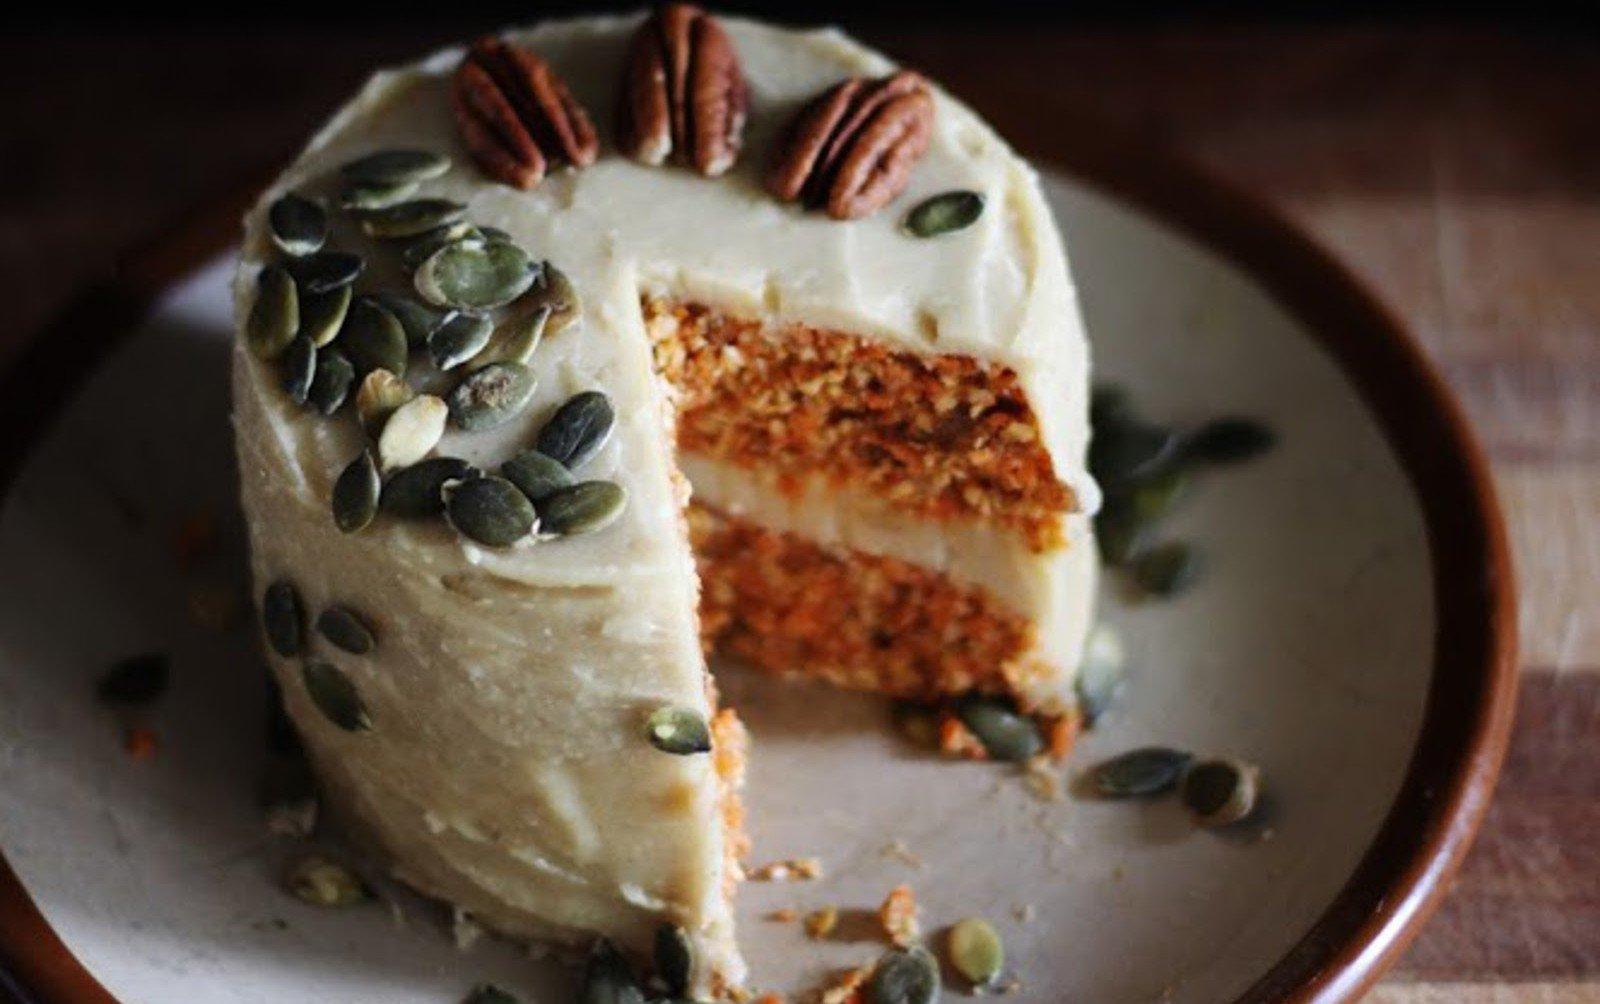 Vegan Cake recipes